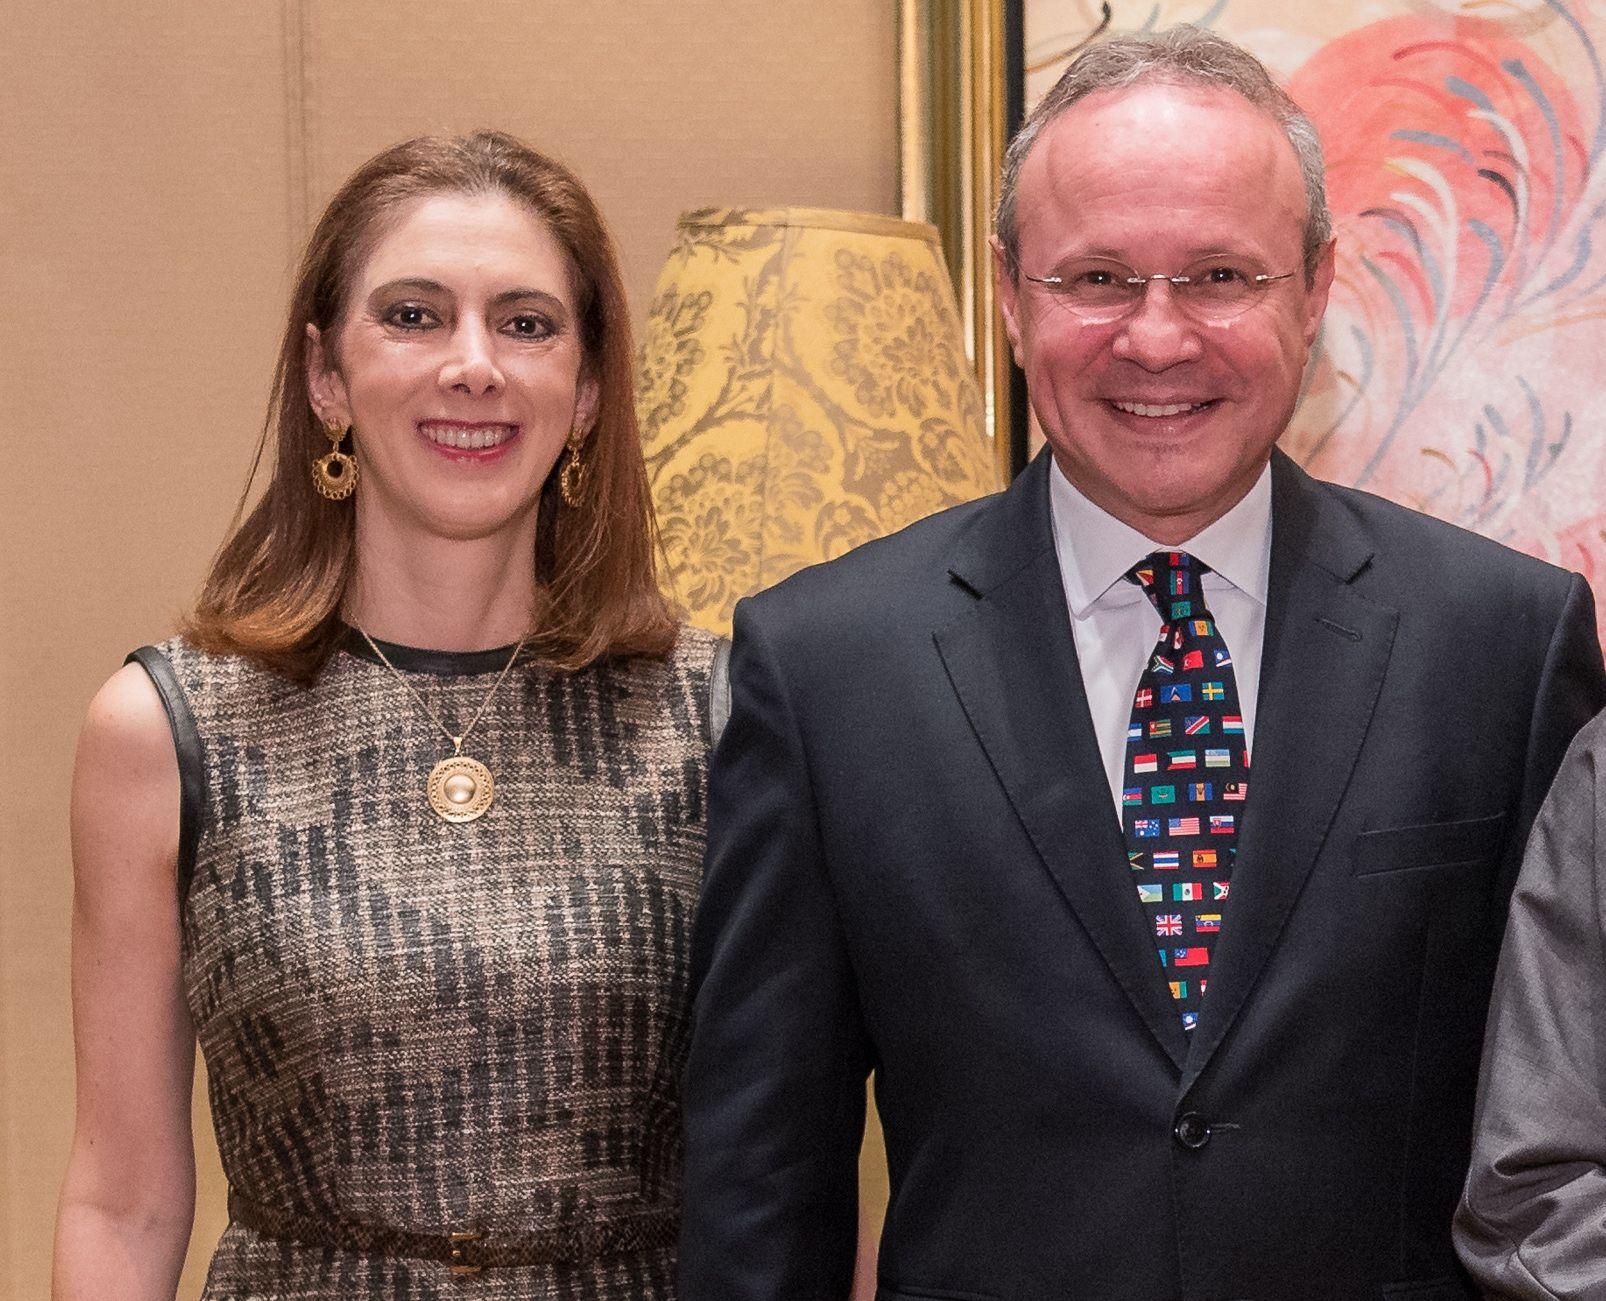 Johanna Salah Chorny, Mauricio Baquero Pardo